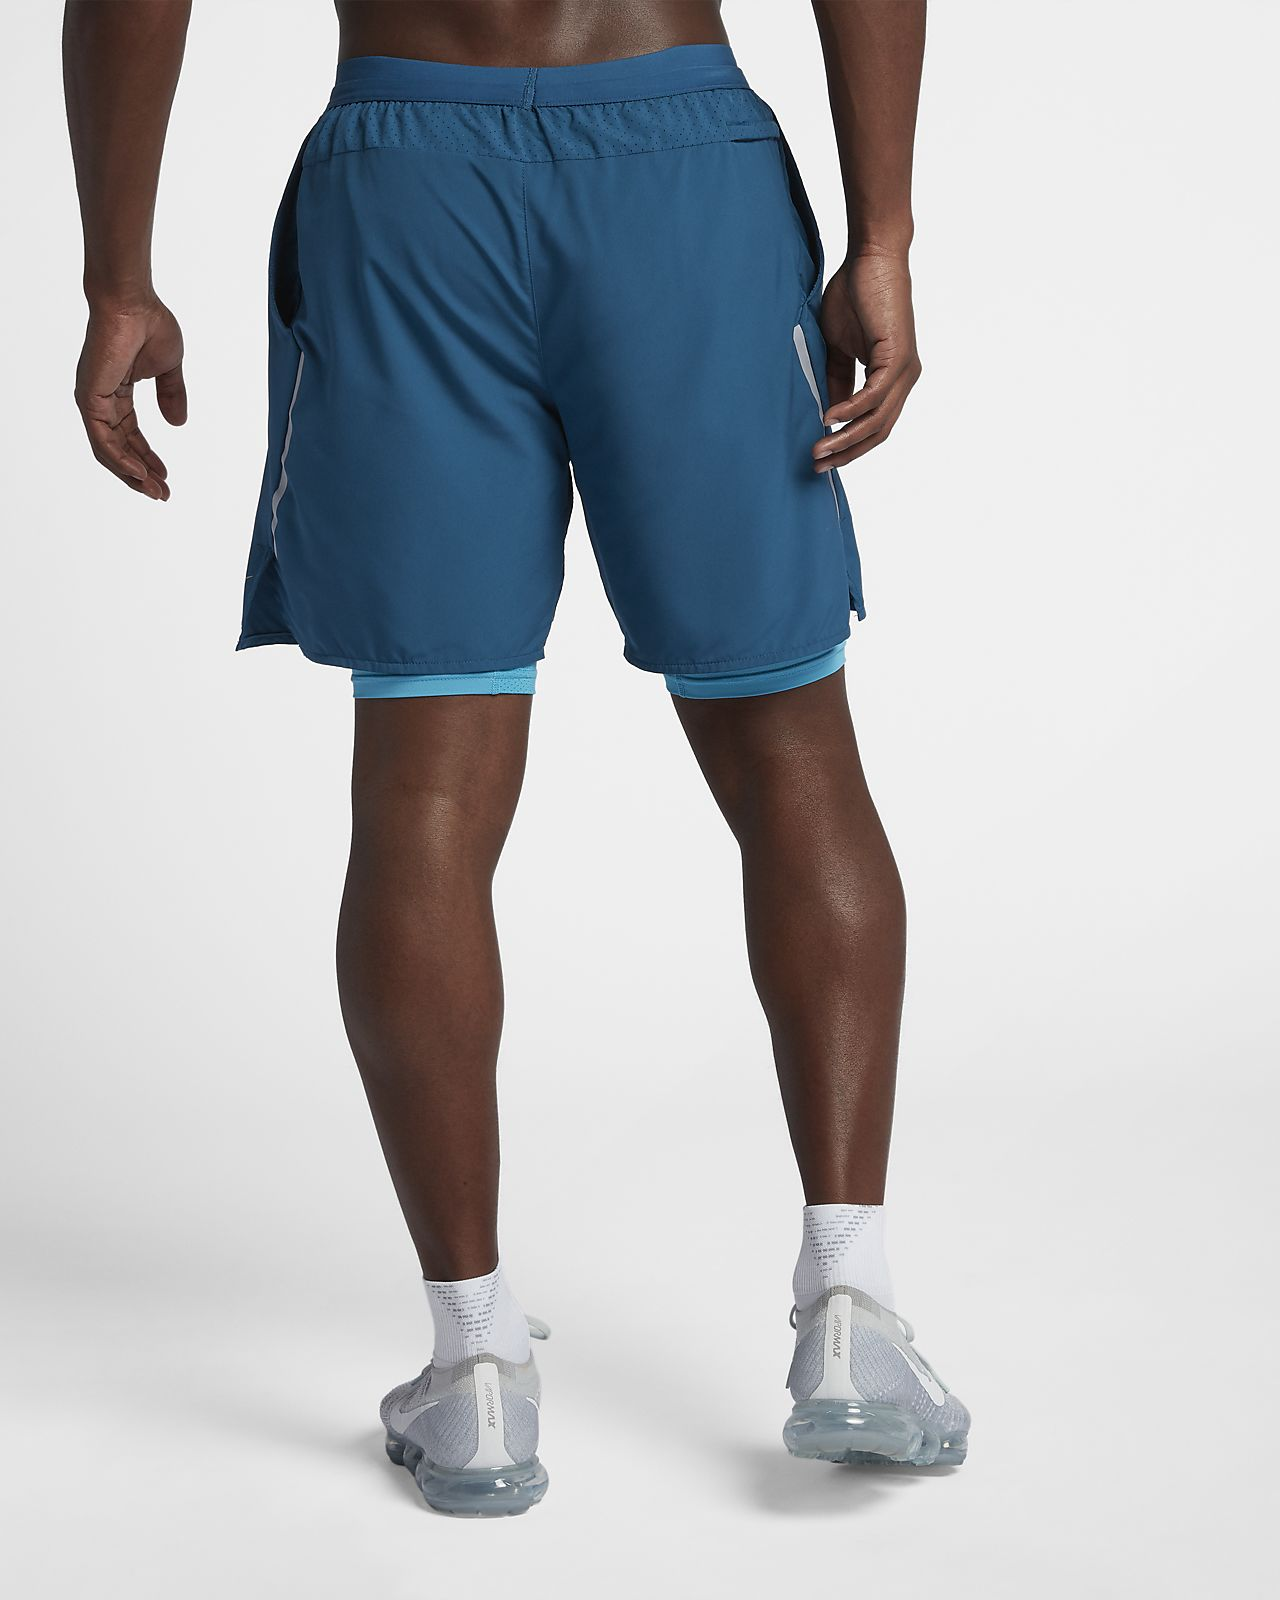 4aee4963beb2 Nike Flex Stride Men s 2-in-1 Running Shorts. Nike.com IE